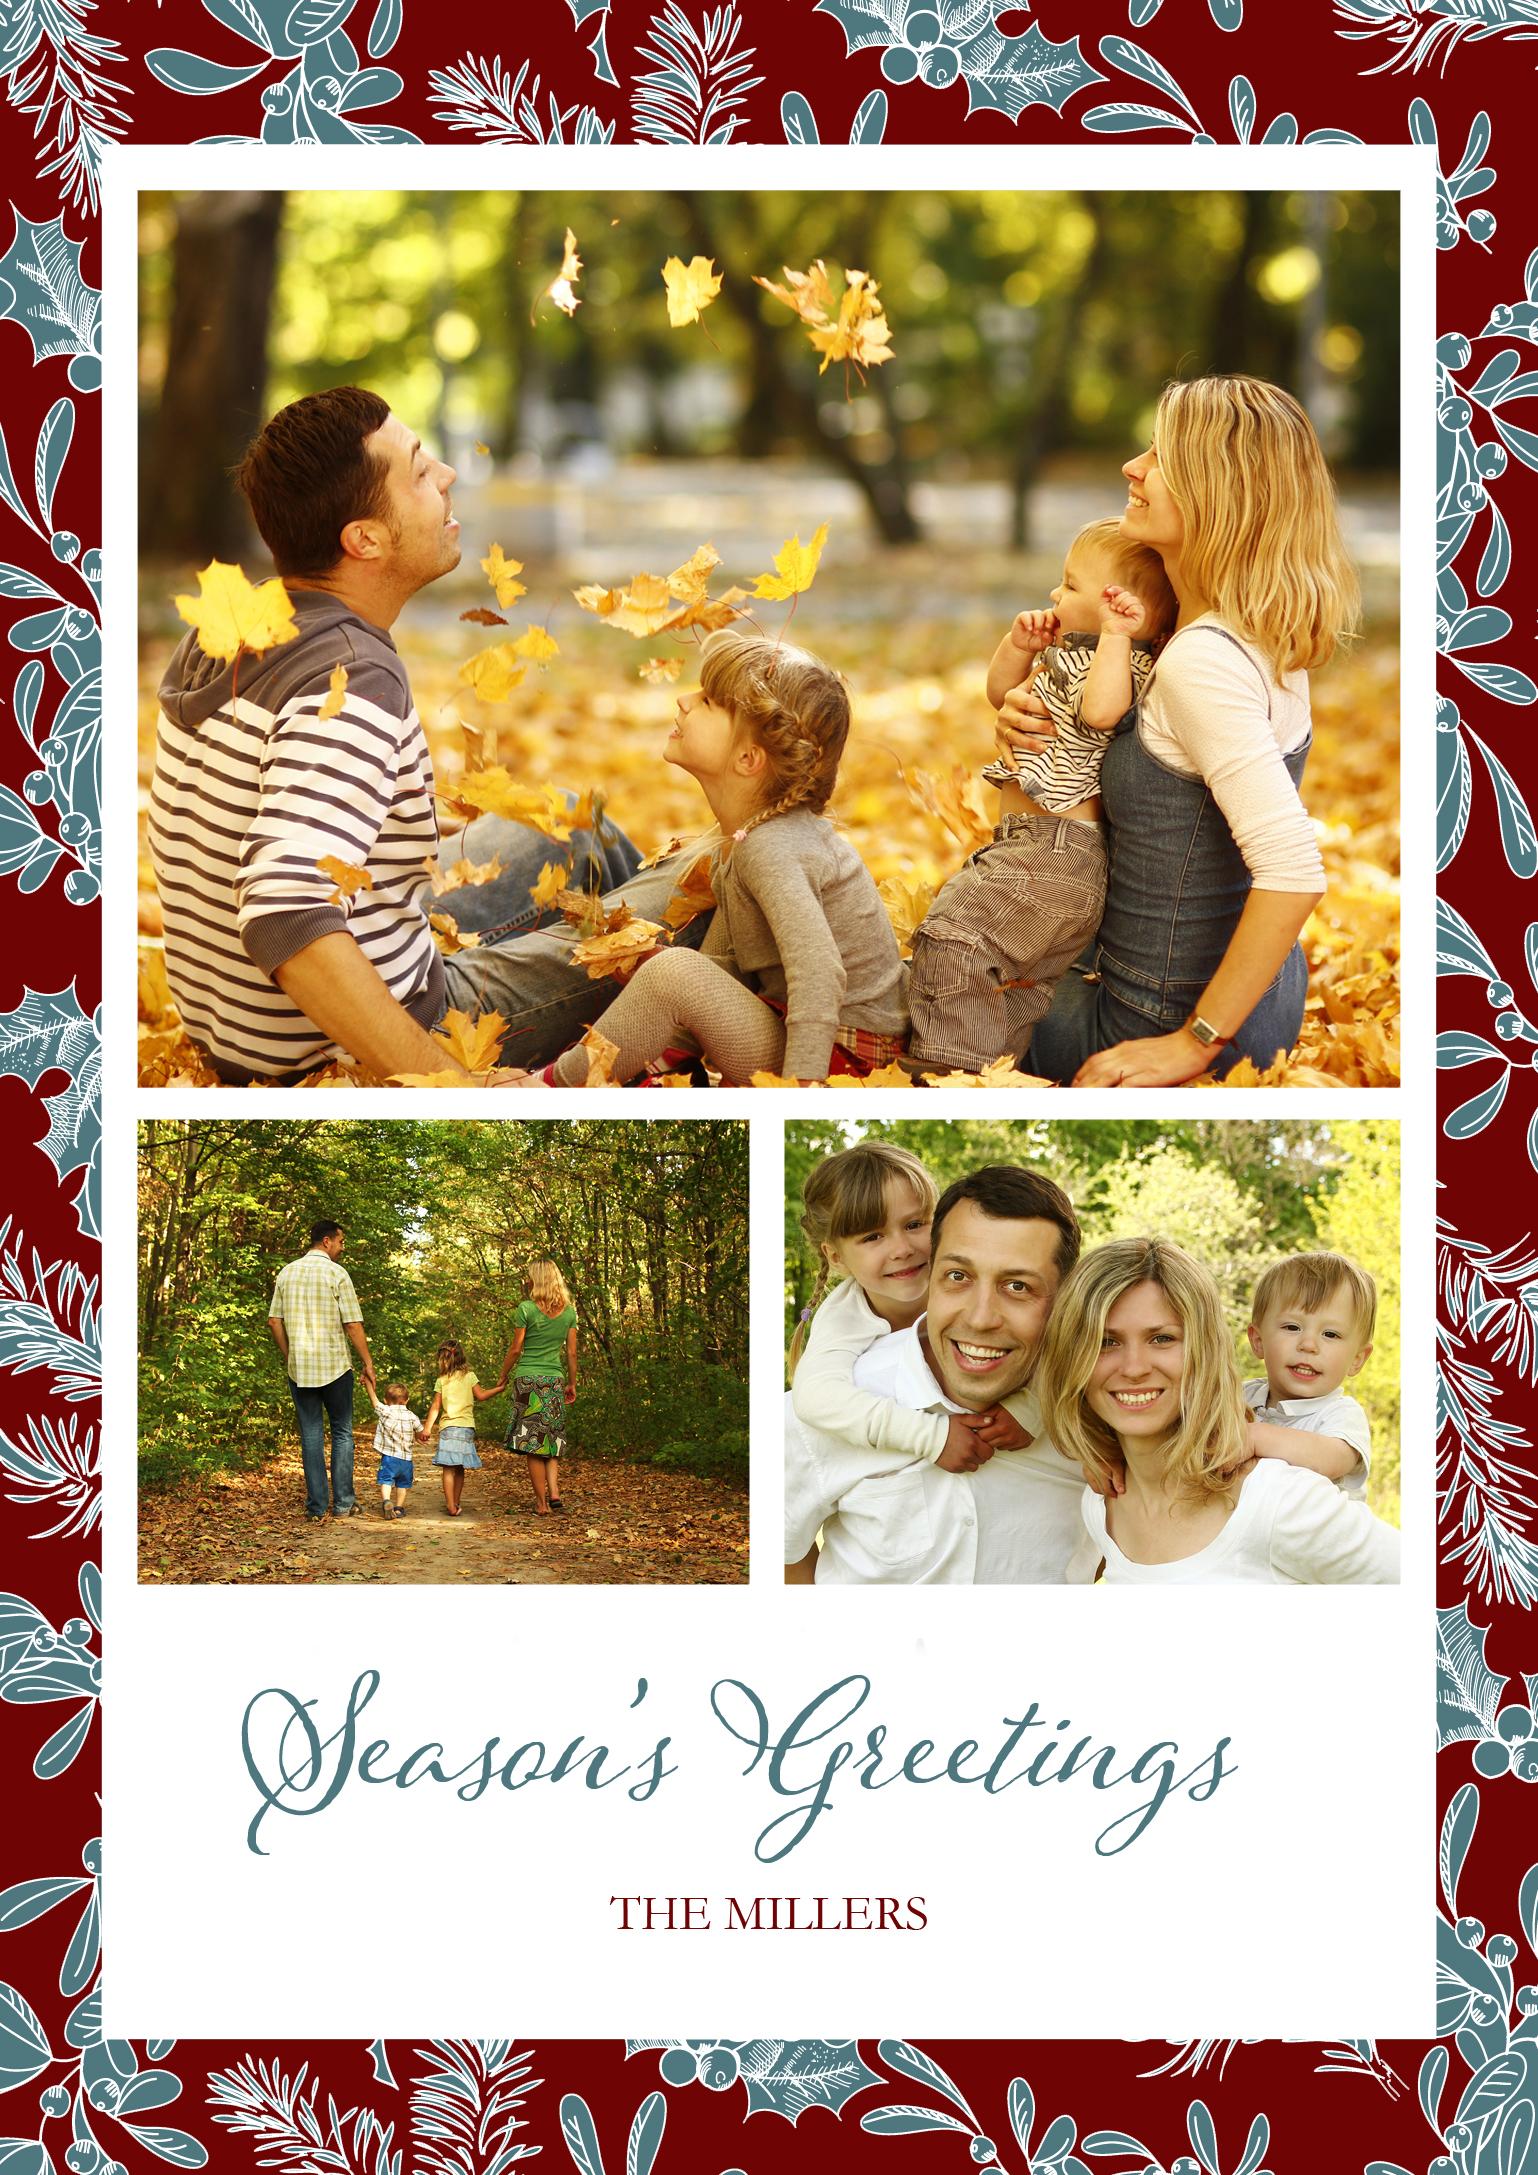 Season's Greetings Christmas Card Photoshop template example image 2